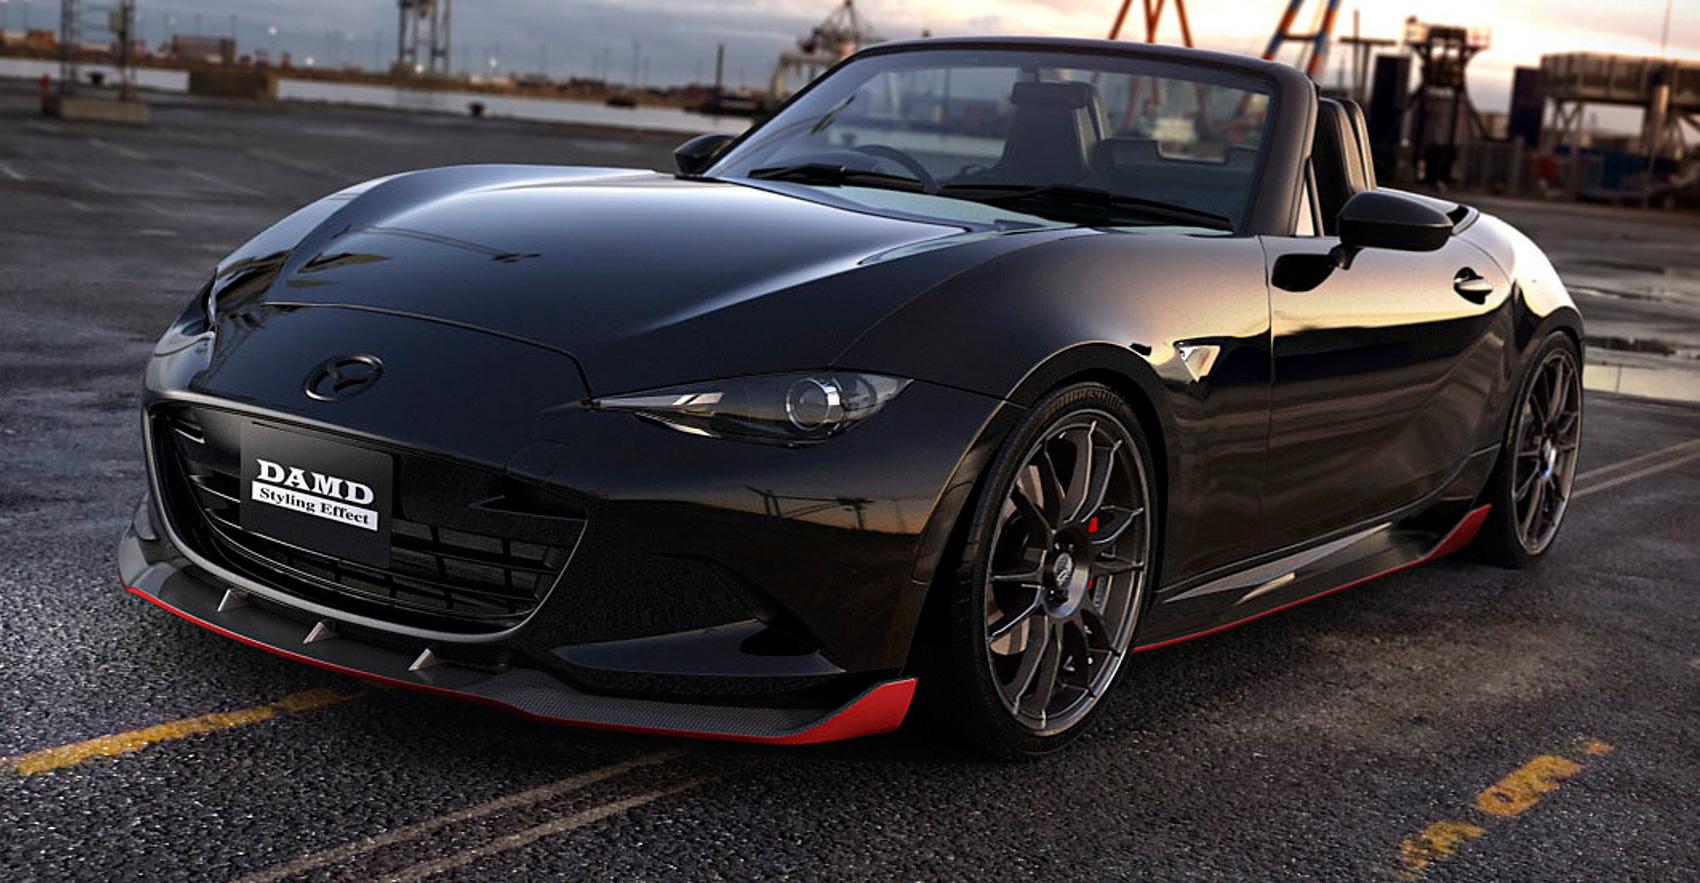 Twin City Mazda >> DAMD Dark Knight Mazda MX-5 - a sinister Roadster